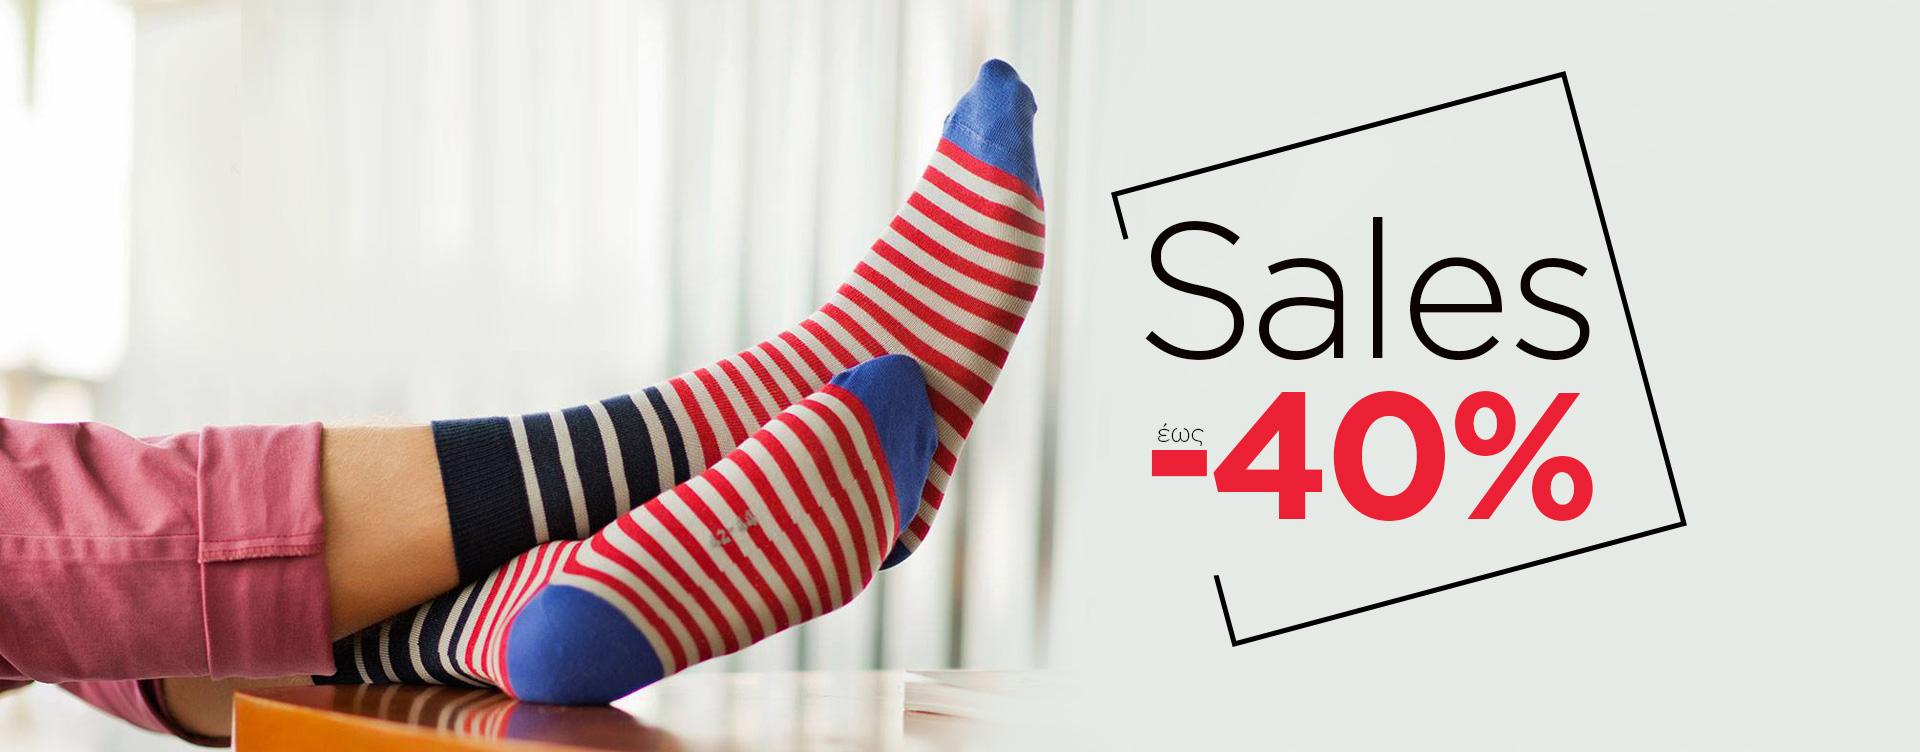 Gatta Κάλτσες